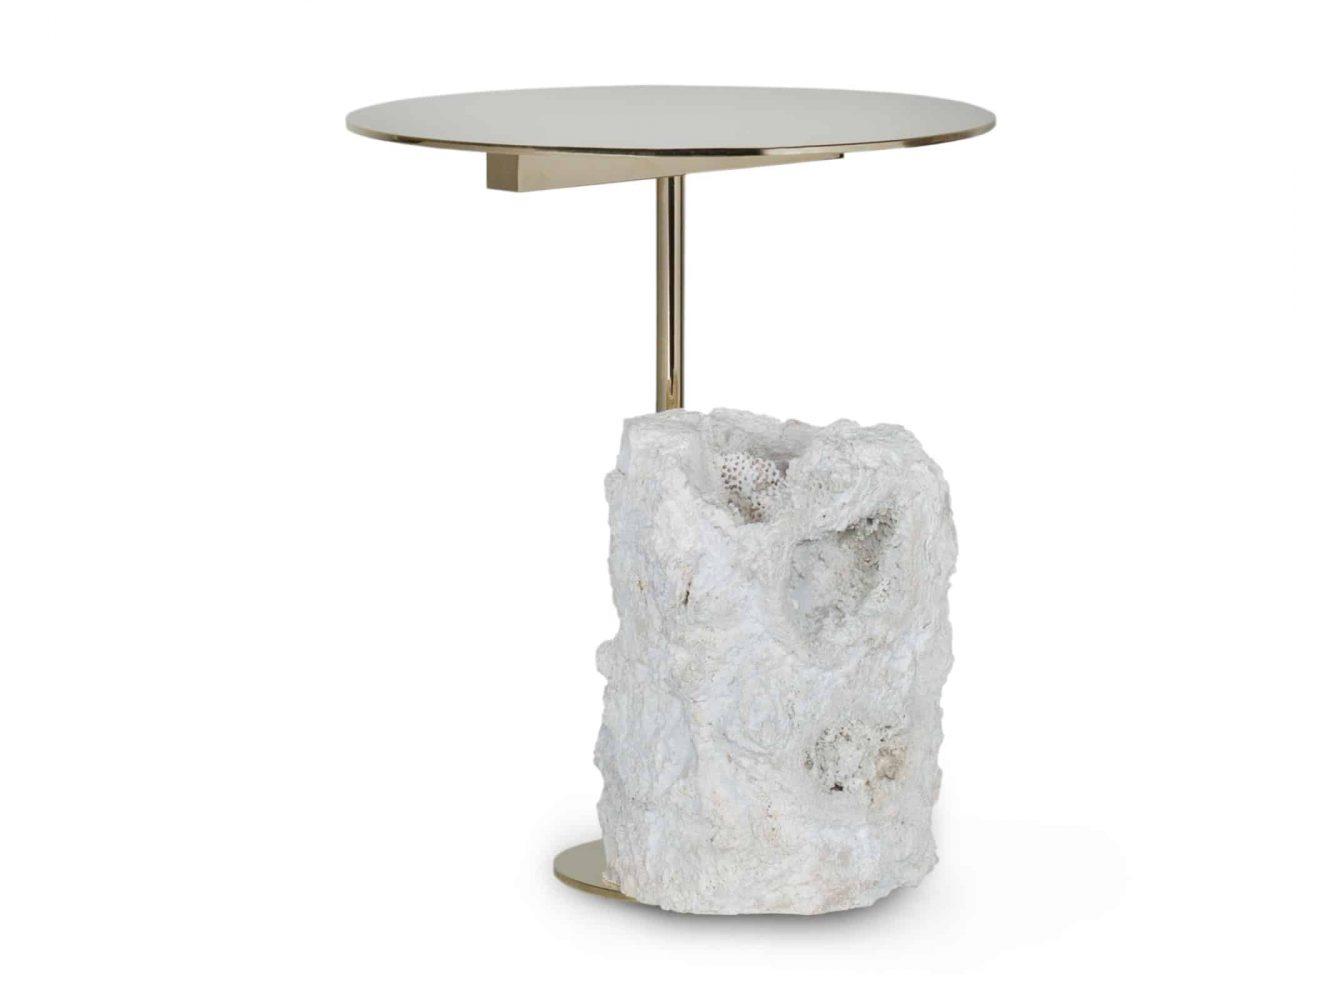 Greenapple Pico Low Table